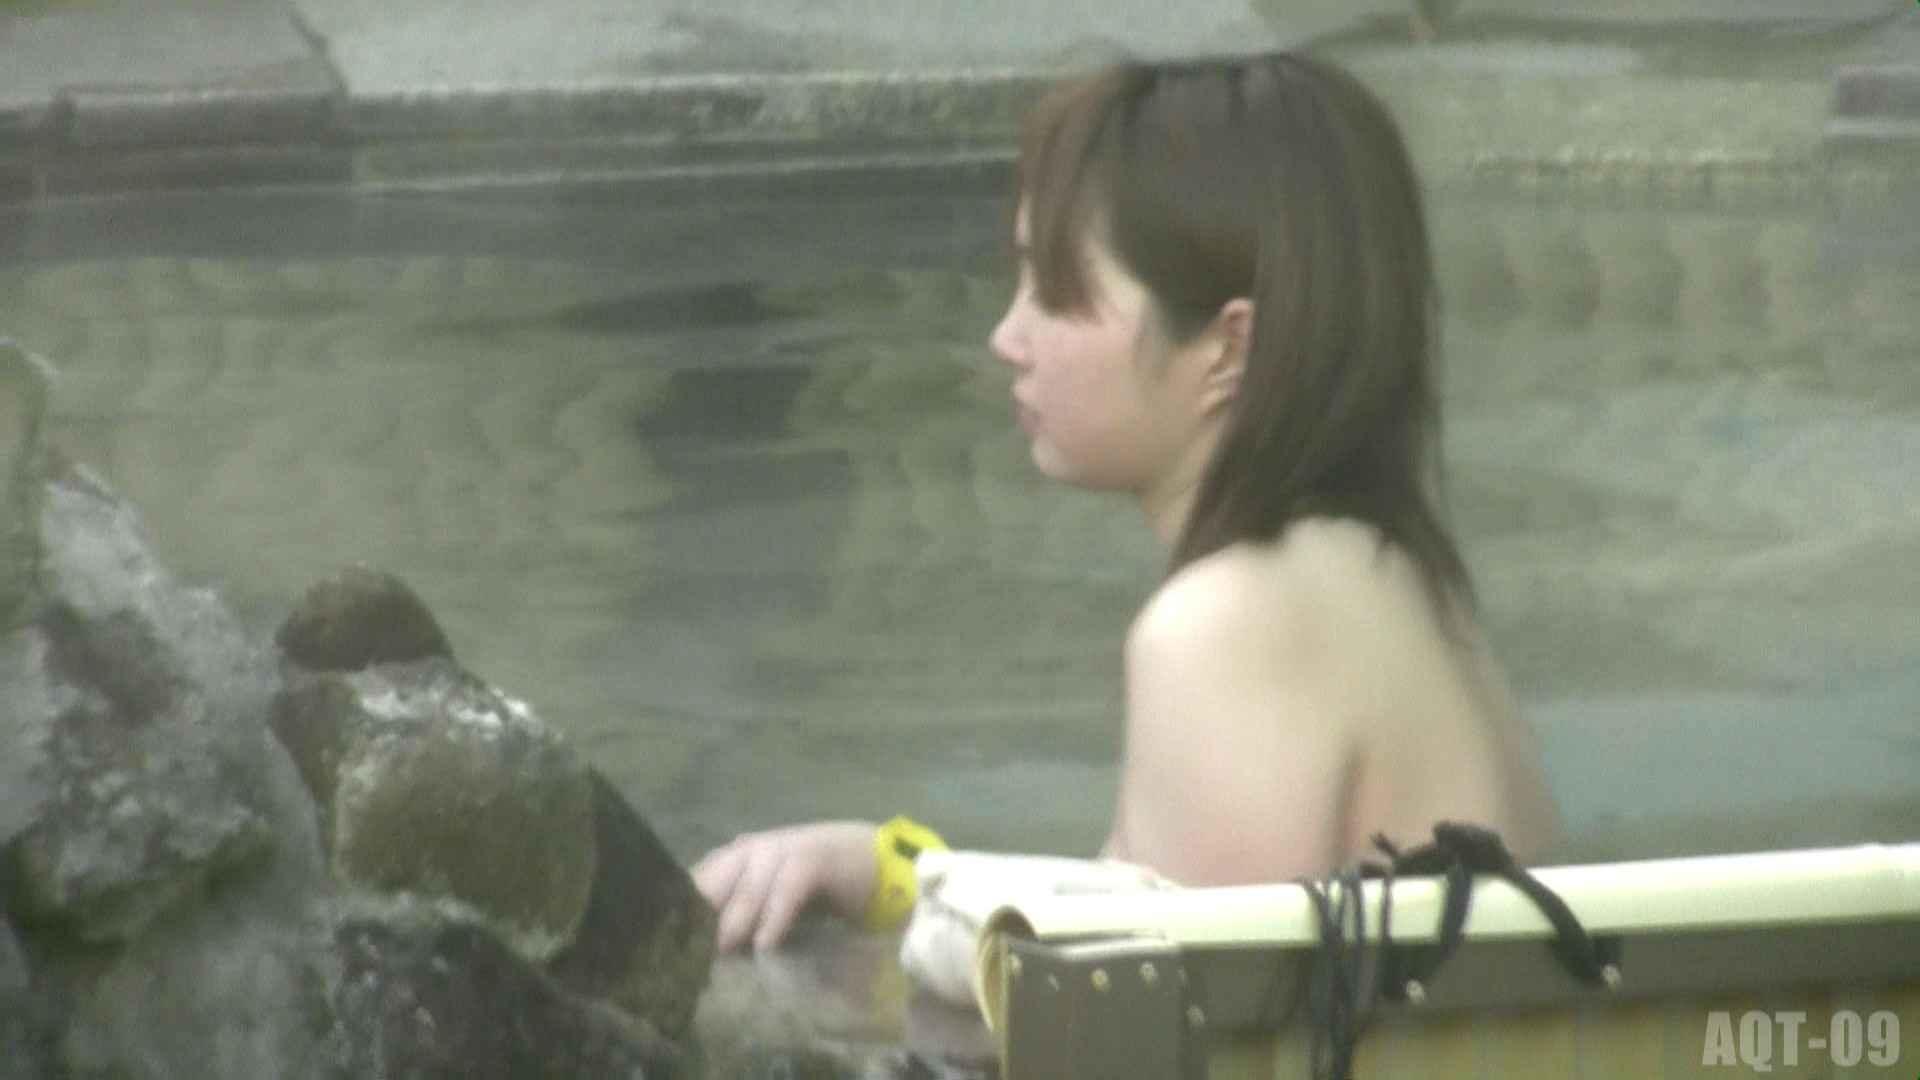 Aquaな露天風呂Vol.781 盗撮 濡れ場動画紹介 93連発 26